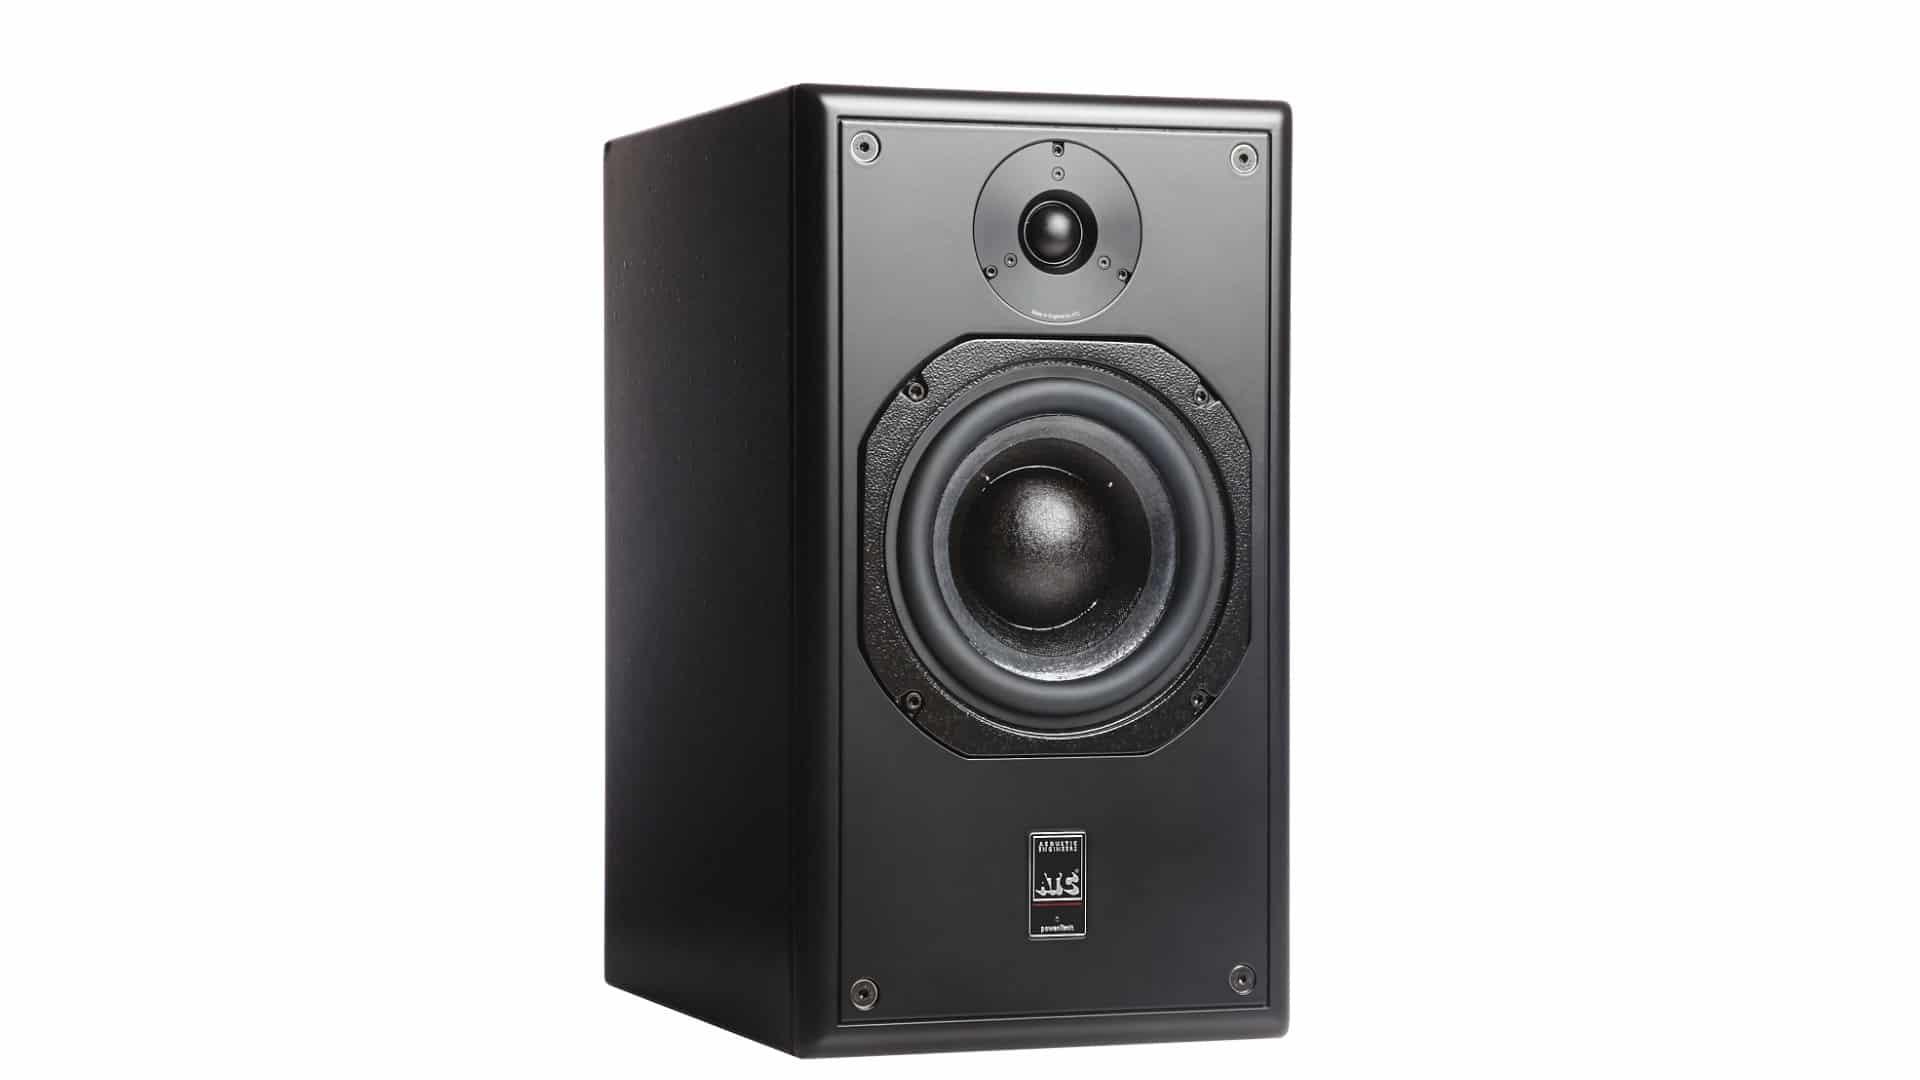 Monitor studyjny bliskiego pola ATC Loudspeakers SCM20ASL Pro Mk2